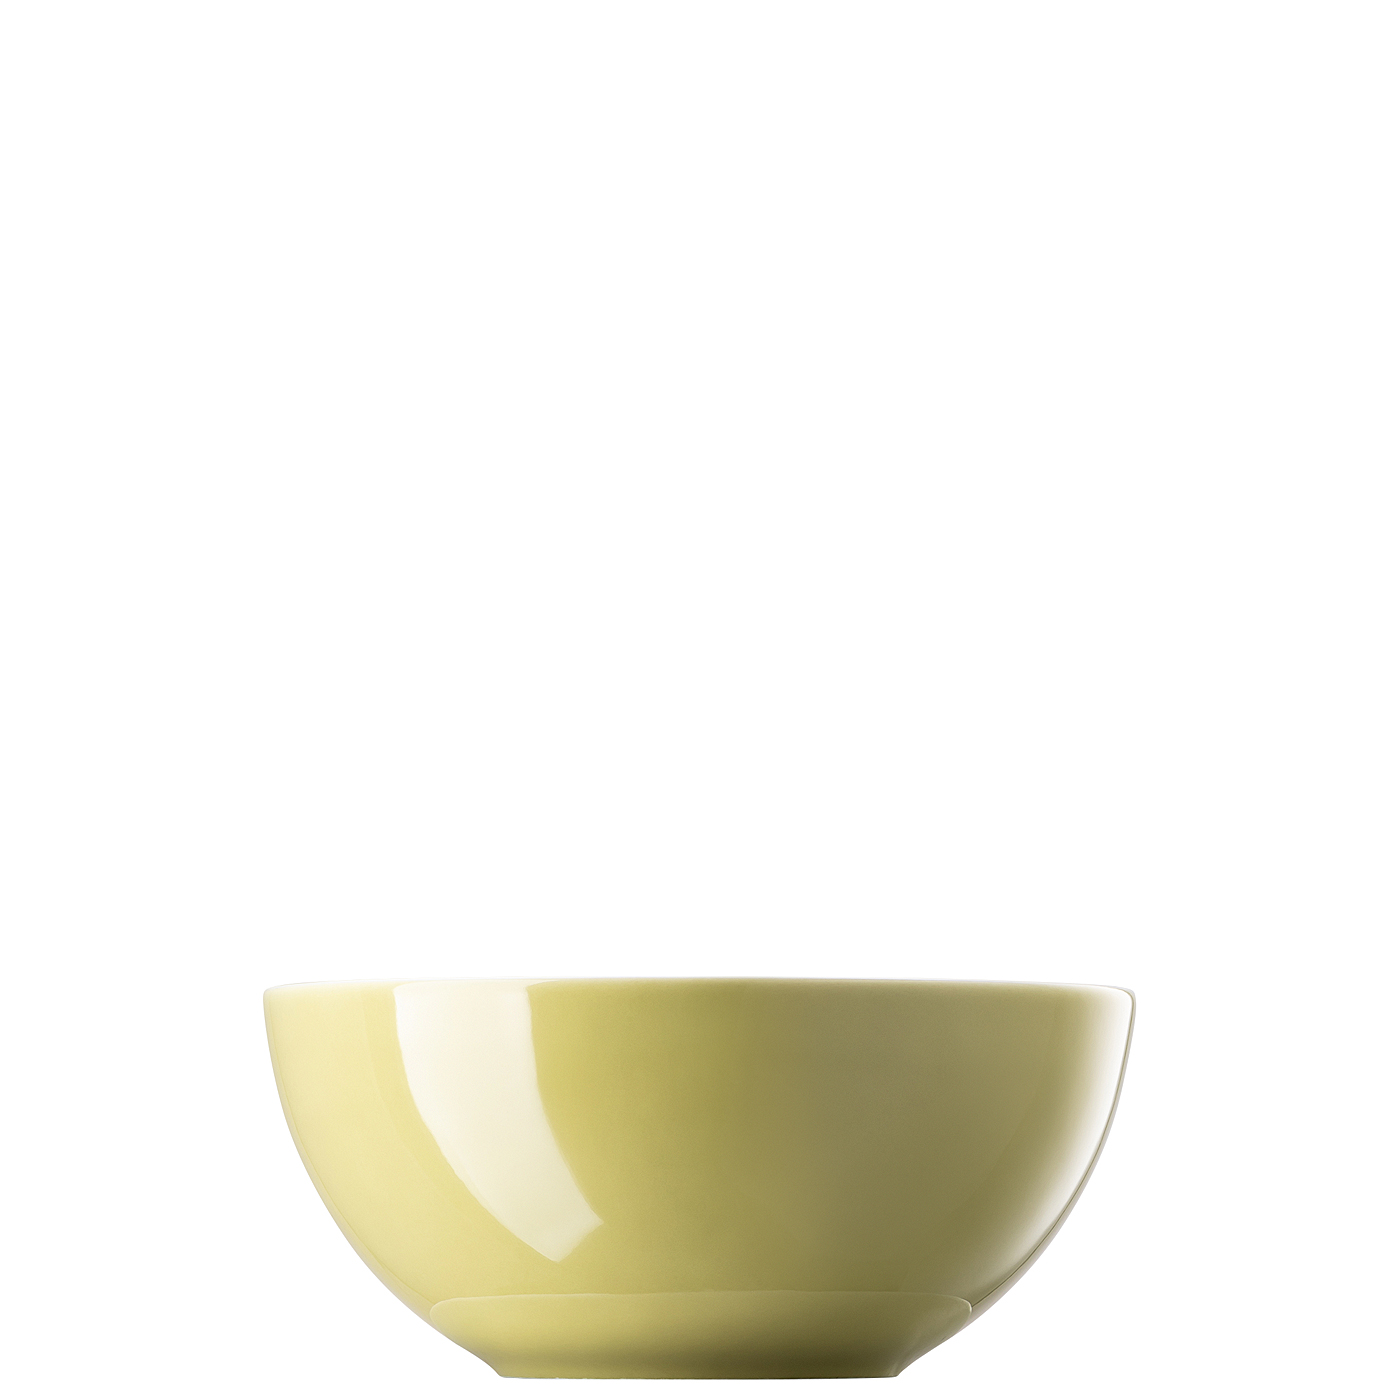 Schüssel 21 cm Sunny Day Avocado Green Thomas Porzellan